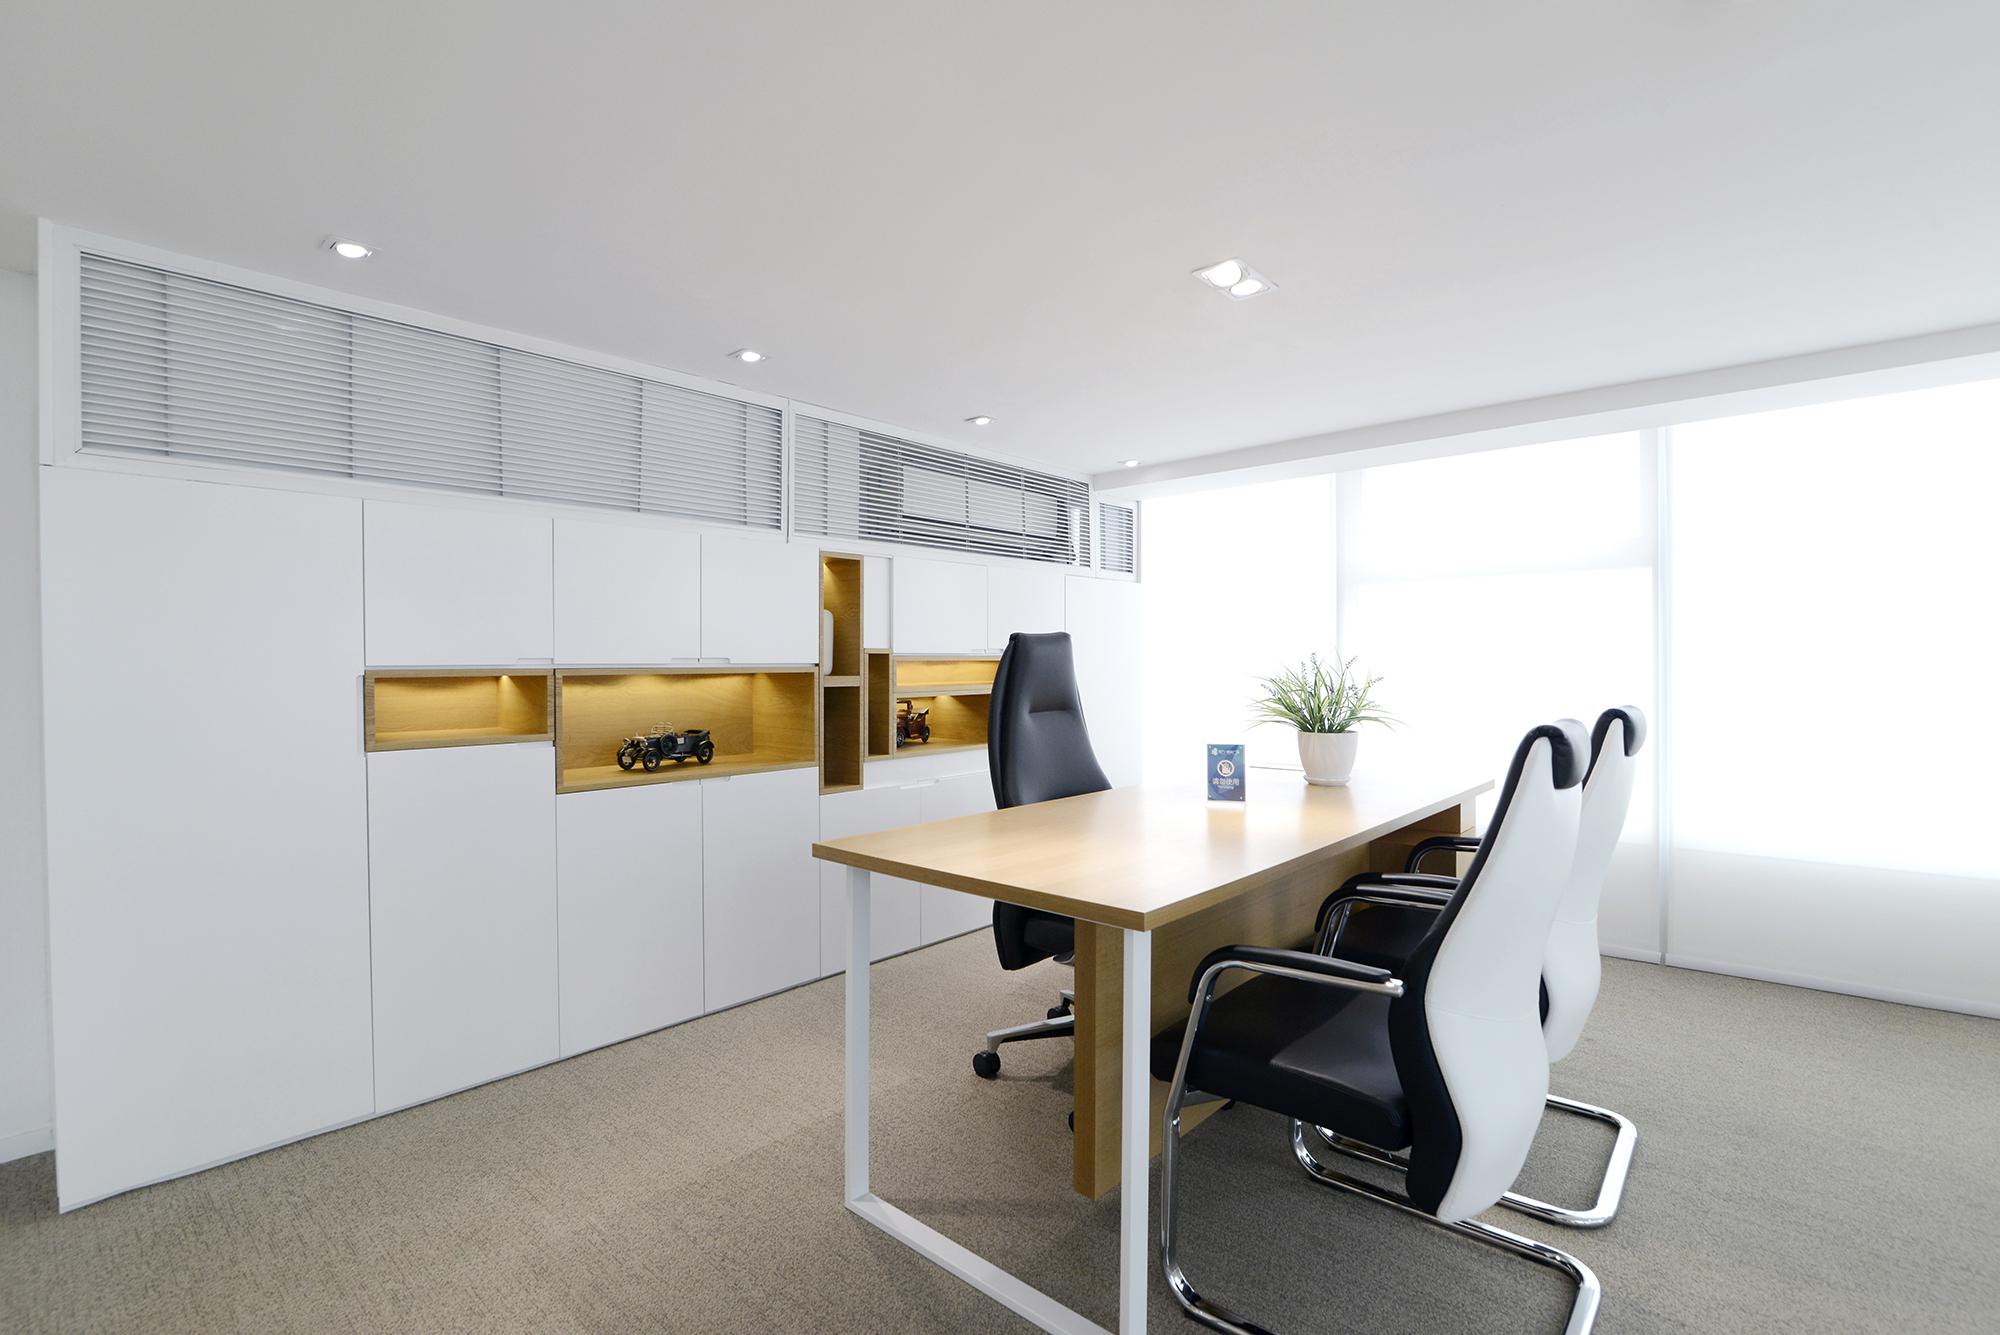 福州宅板辦公室 2 Fuzhou Office Model Room 2